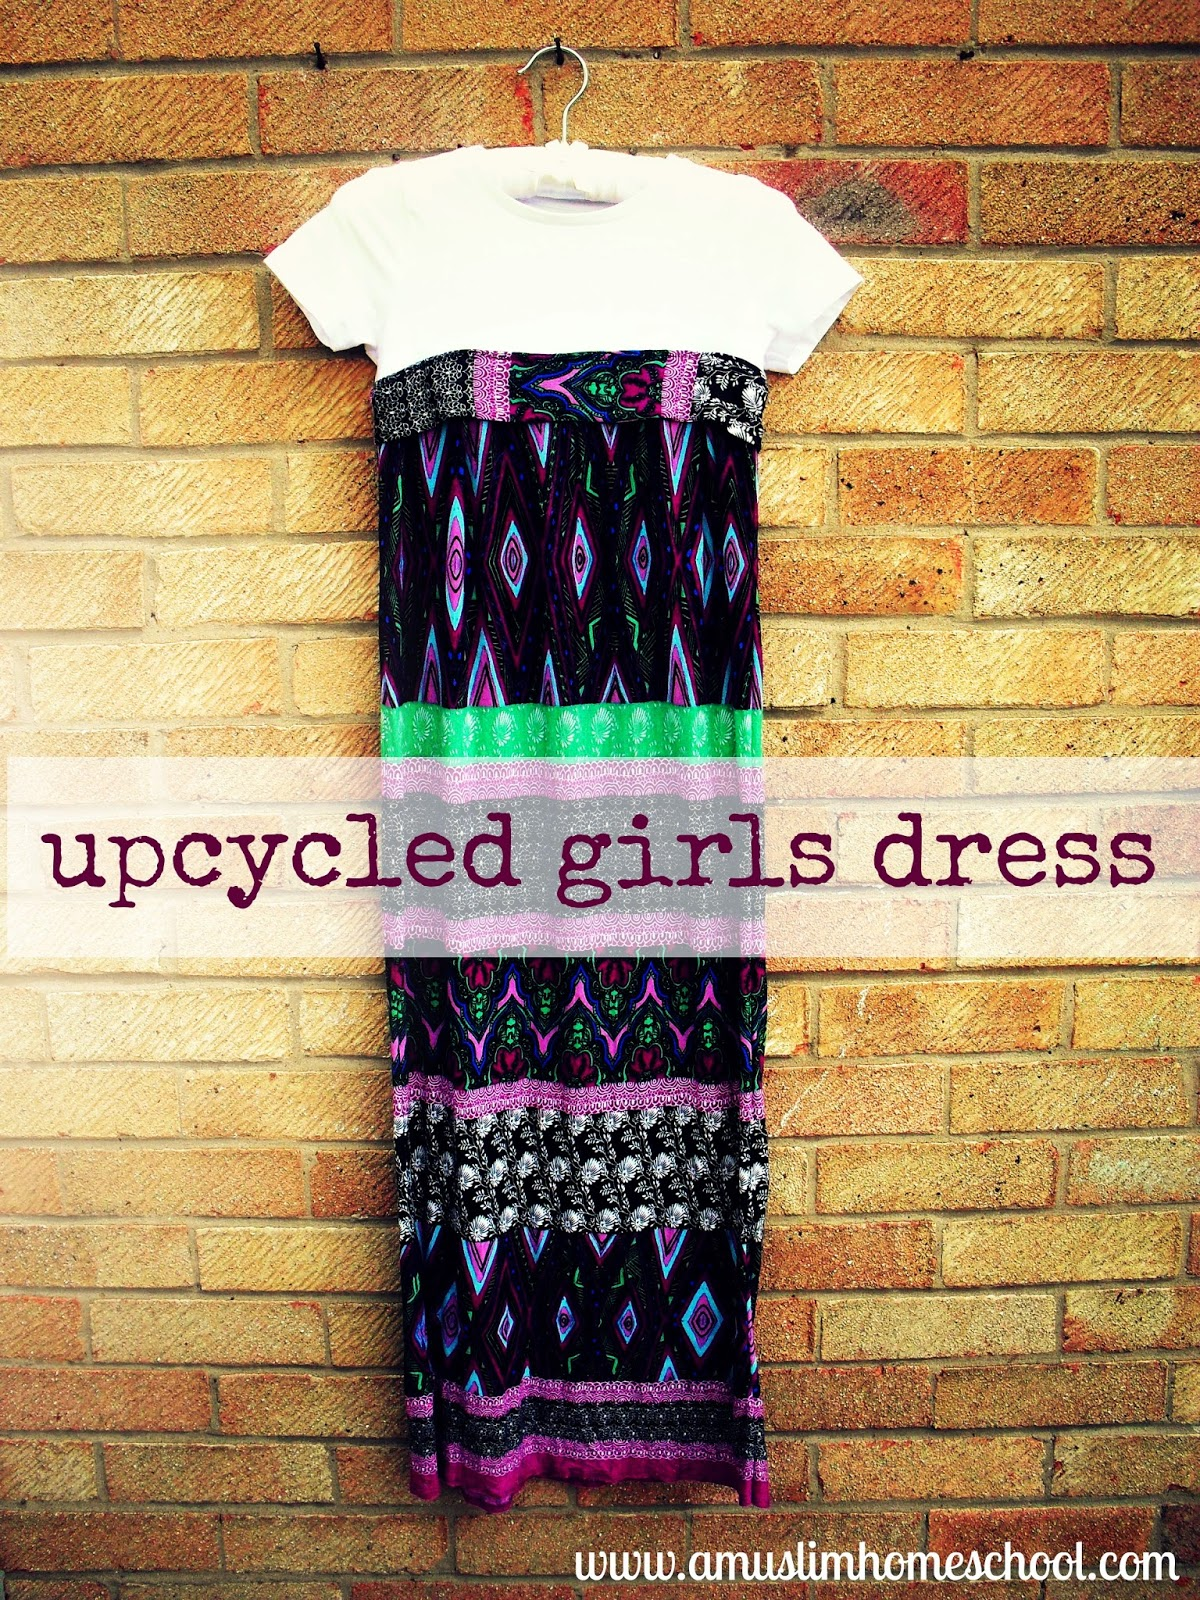 upcycled girls t-shirt dress